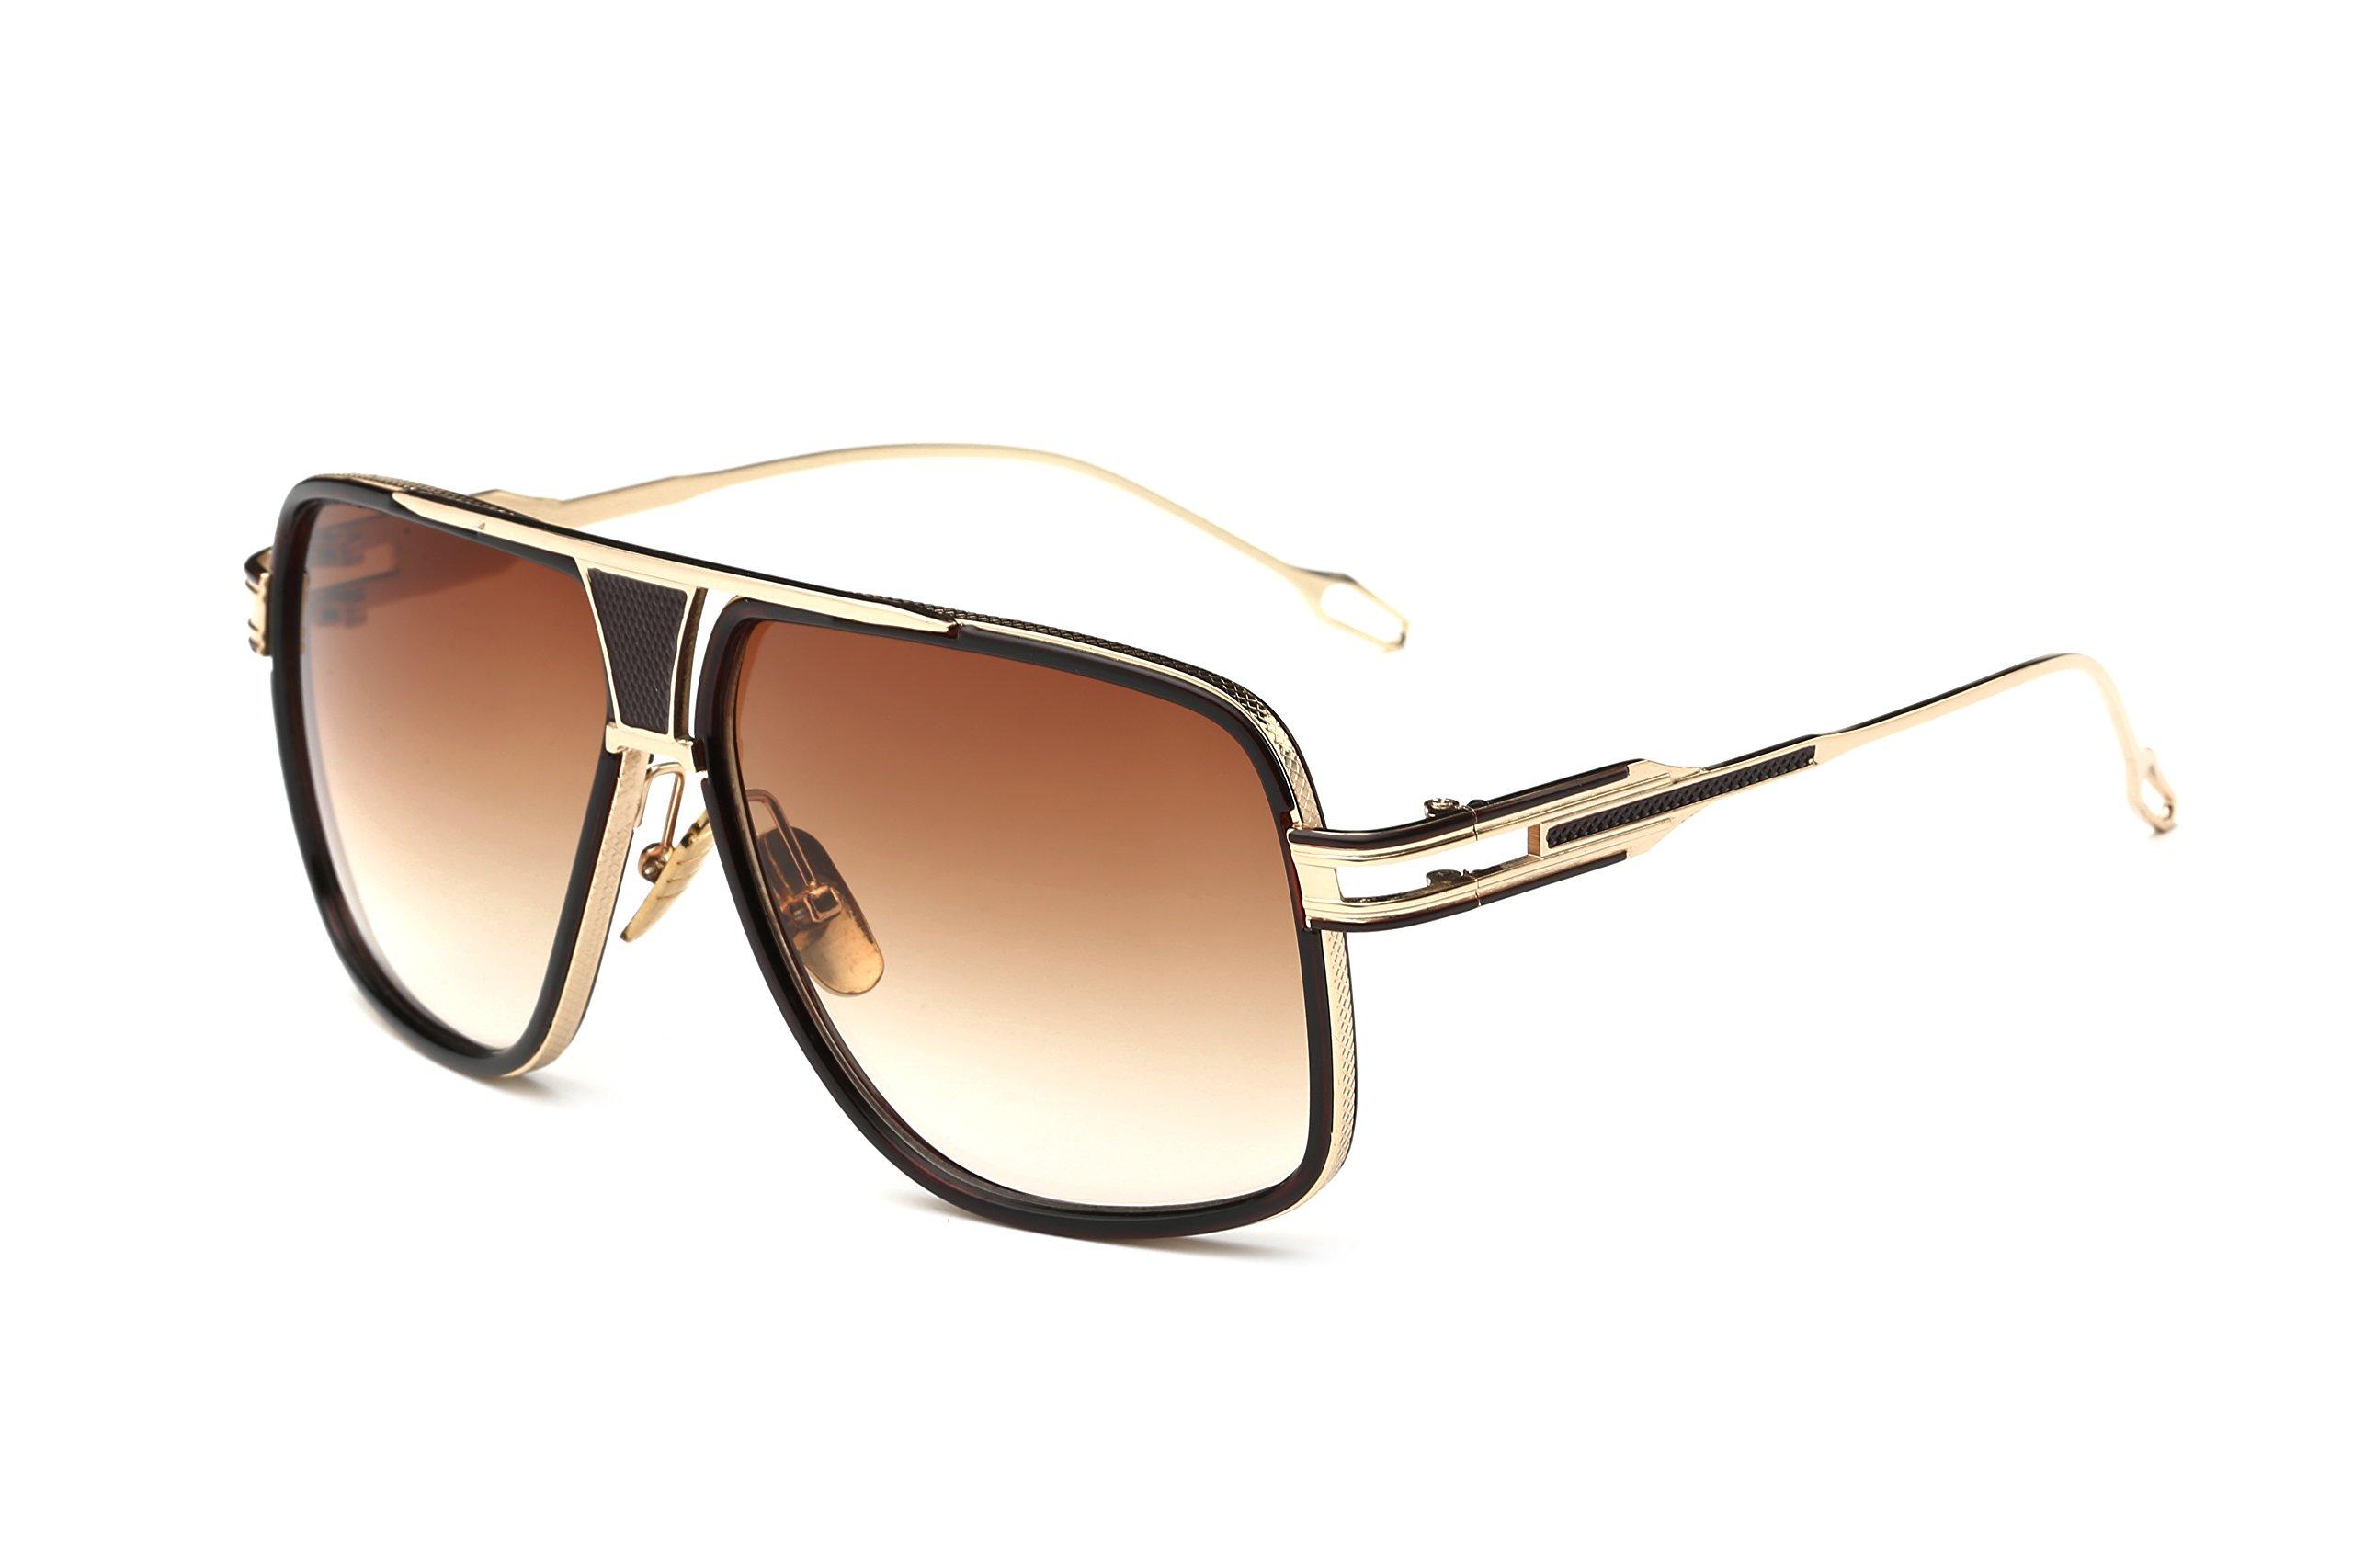 Gobiger Aviator Sunglasses for Men 100% UV Protection Goggle Alloy Frame 59mm Lens Width (Gold Frame, Brown)